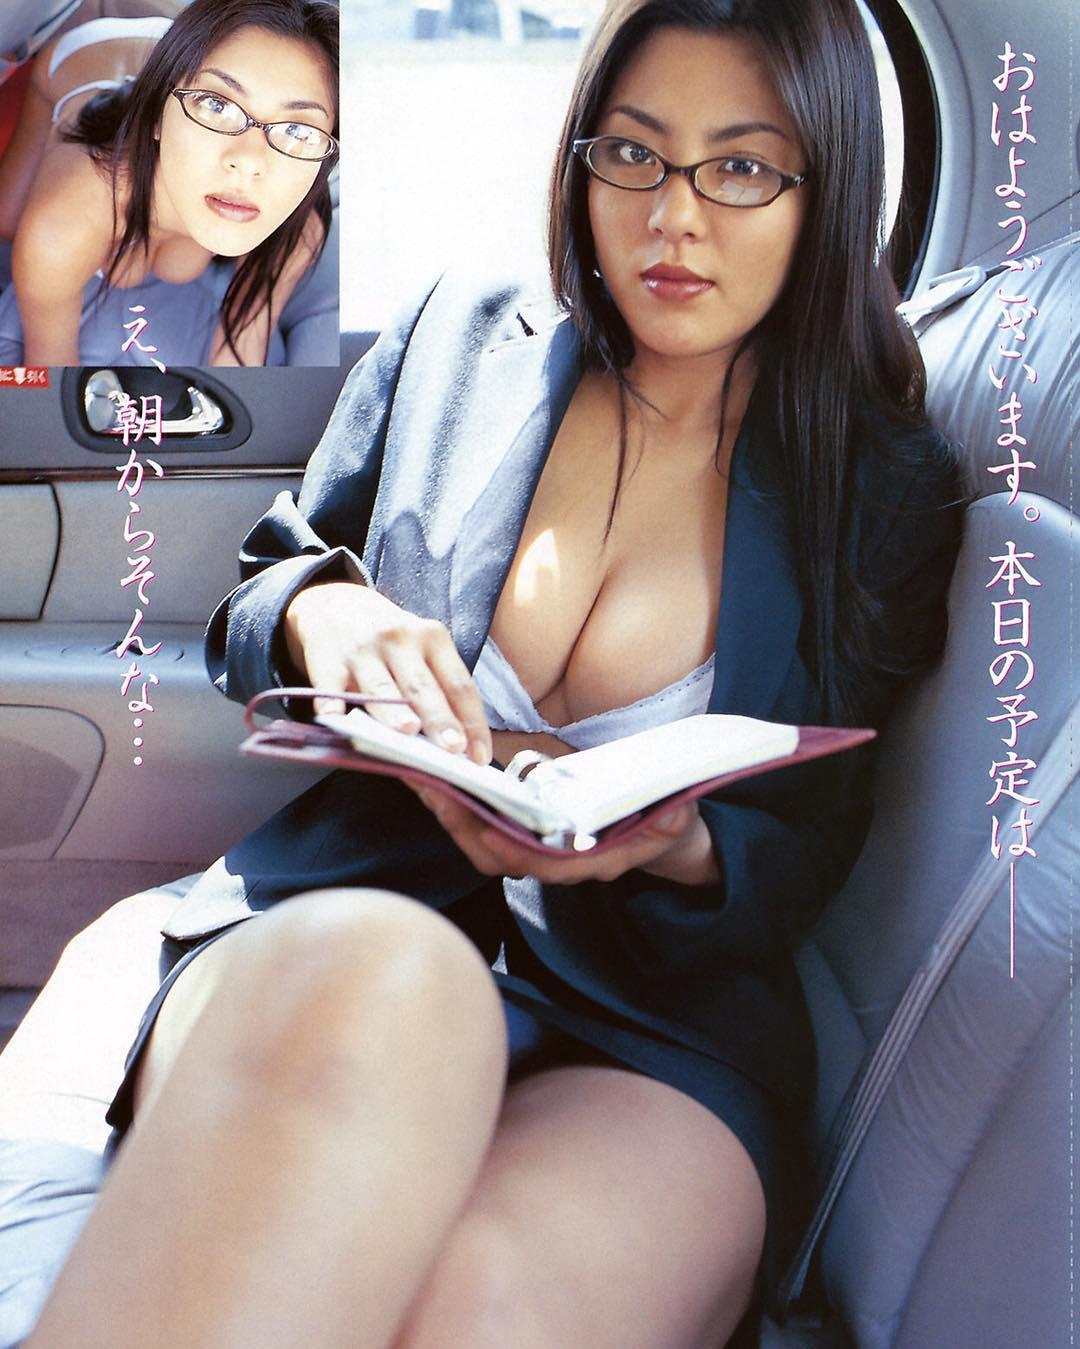 nemoto_harumi272.jpg